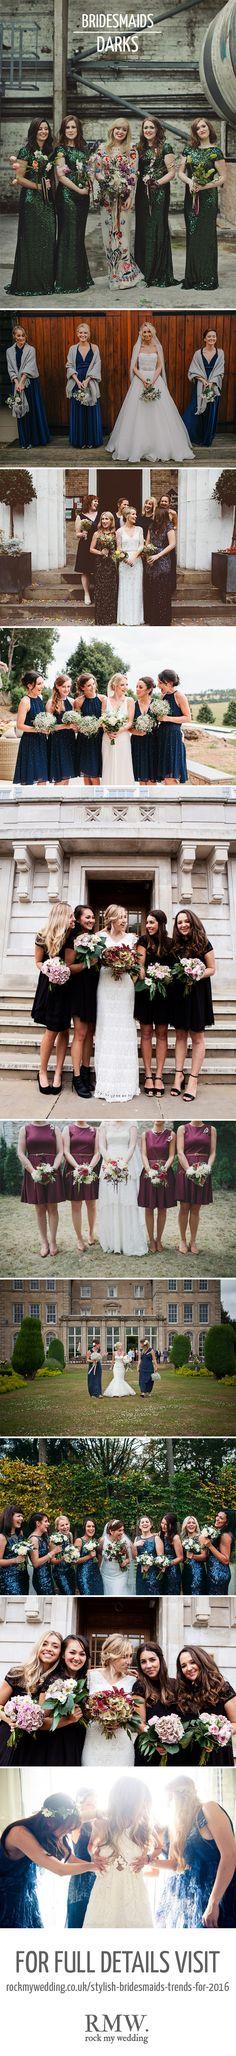 Dark Bridesmaids Dresses   Bridesmaid Inspiration   http://www.rockmywedding.co.uk/stylish-bridesmaids-trends-for-2016/